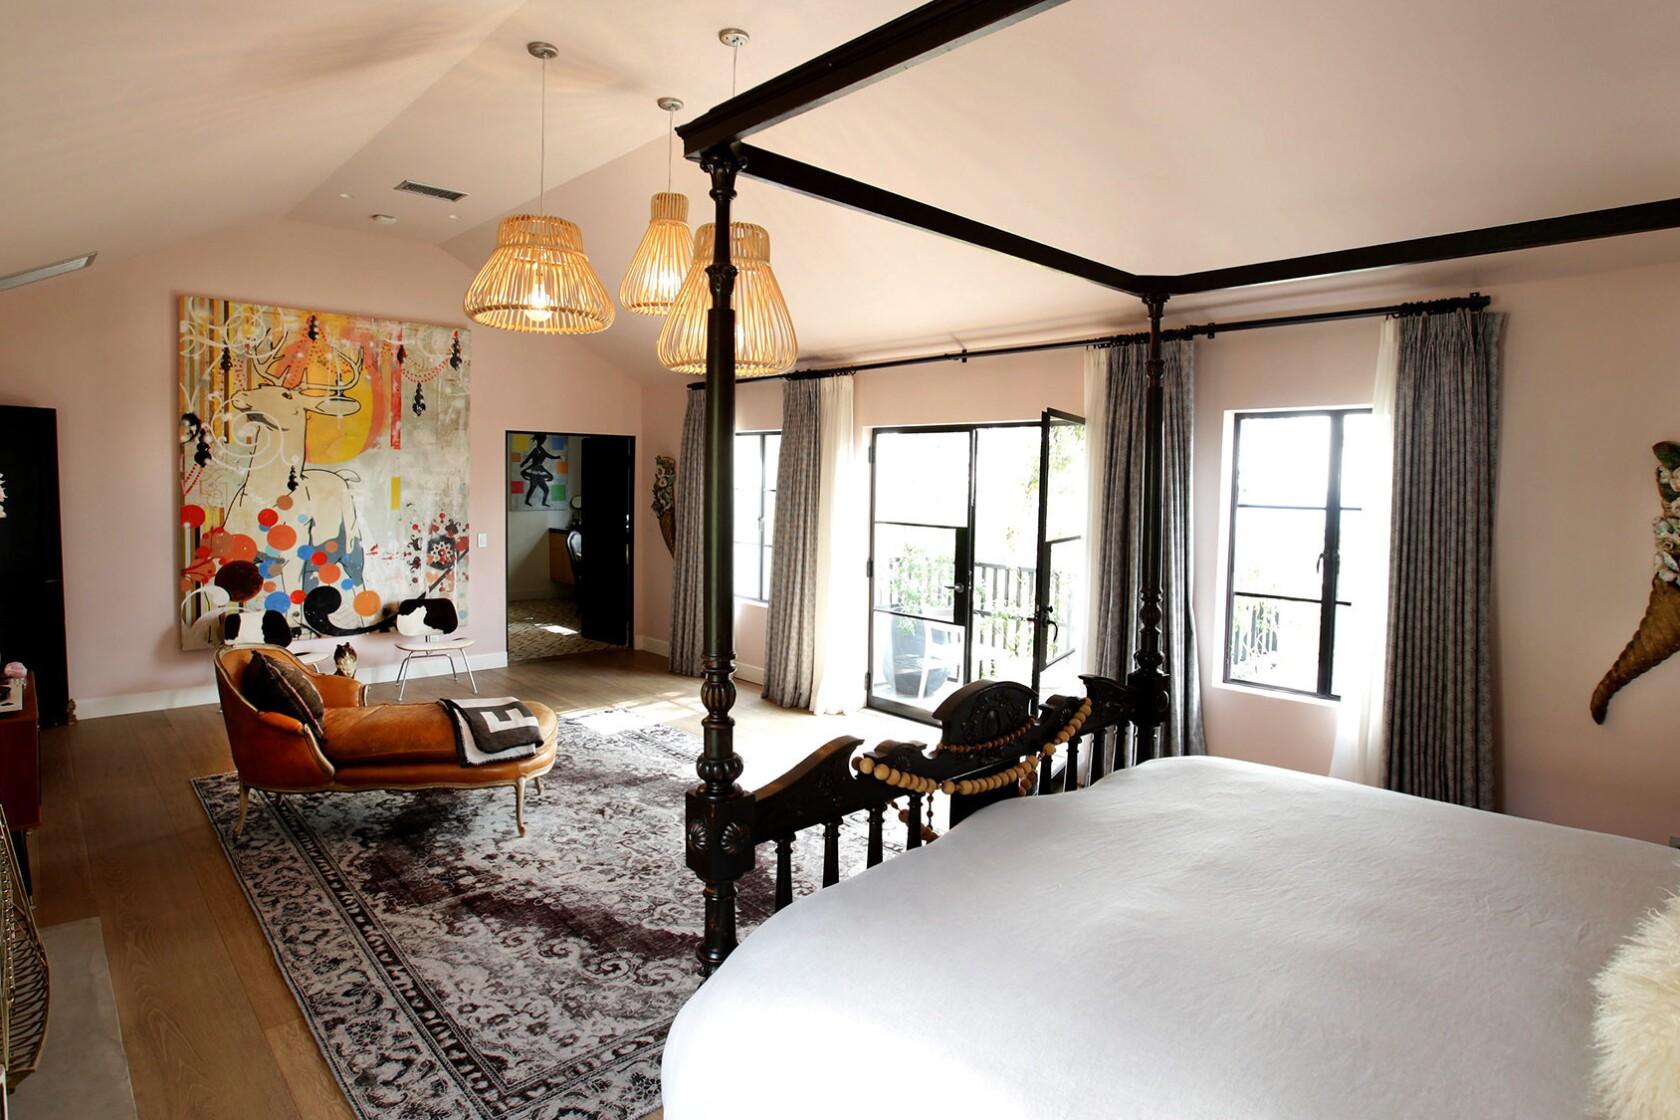 My Favorite Room In Cortney Novogratz S Castle The Design Aesthetic Is Egalitarian Los Angeles Times